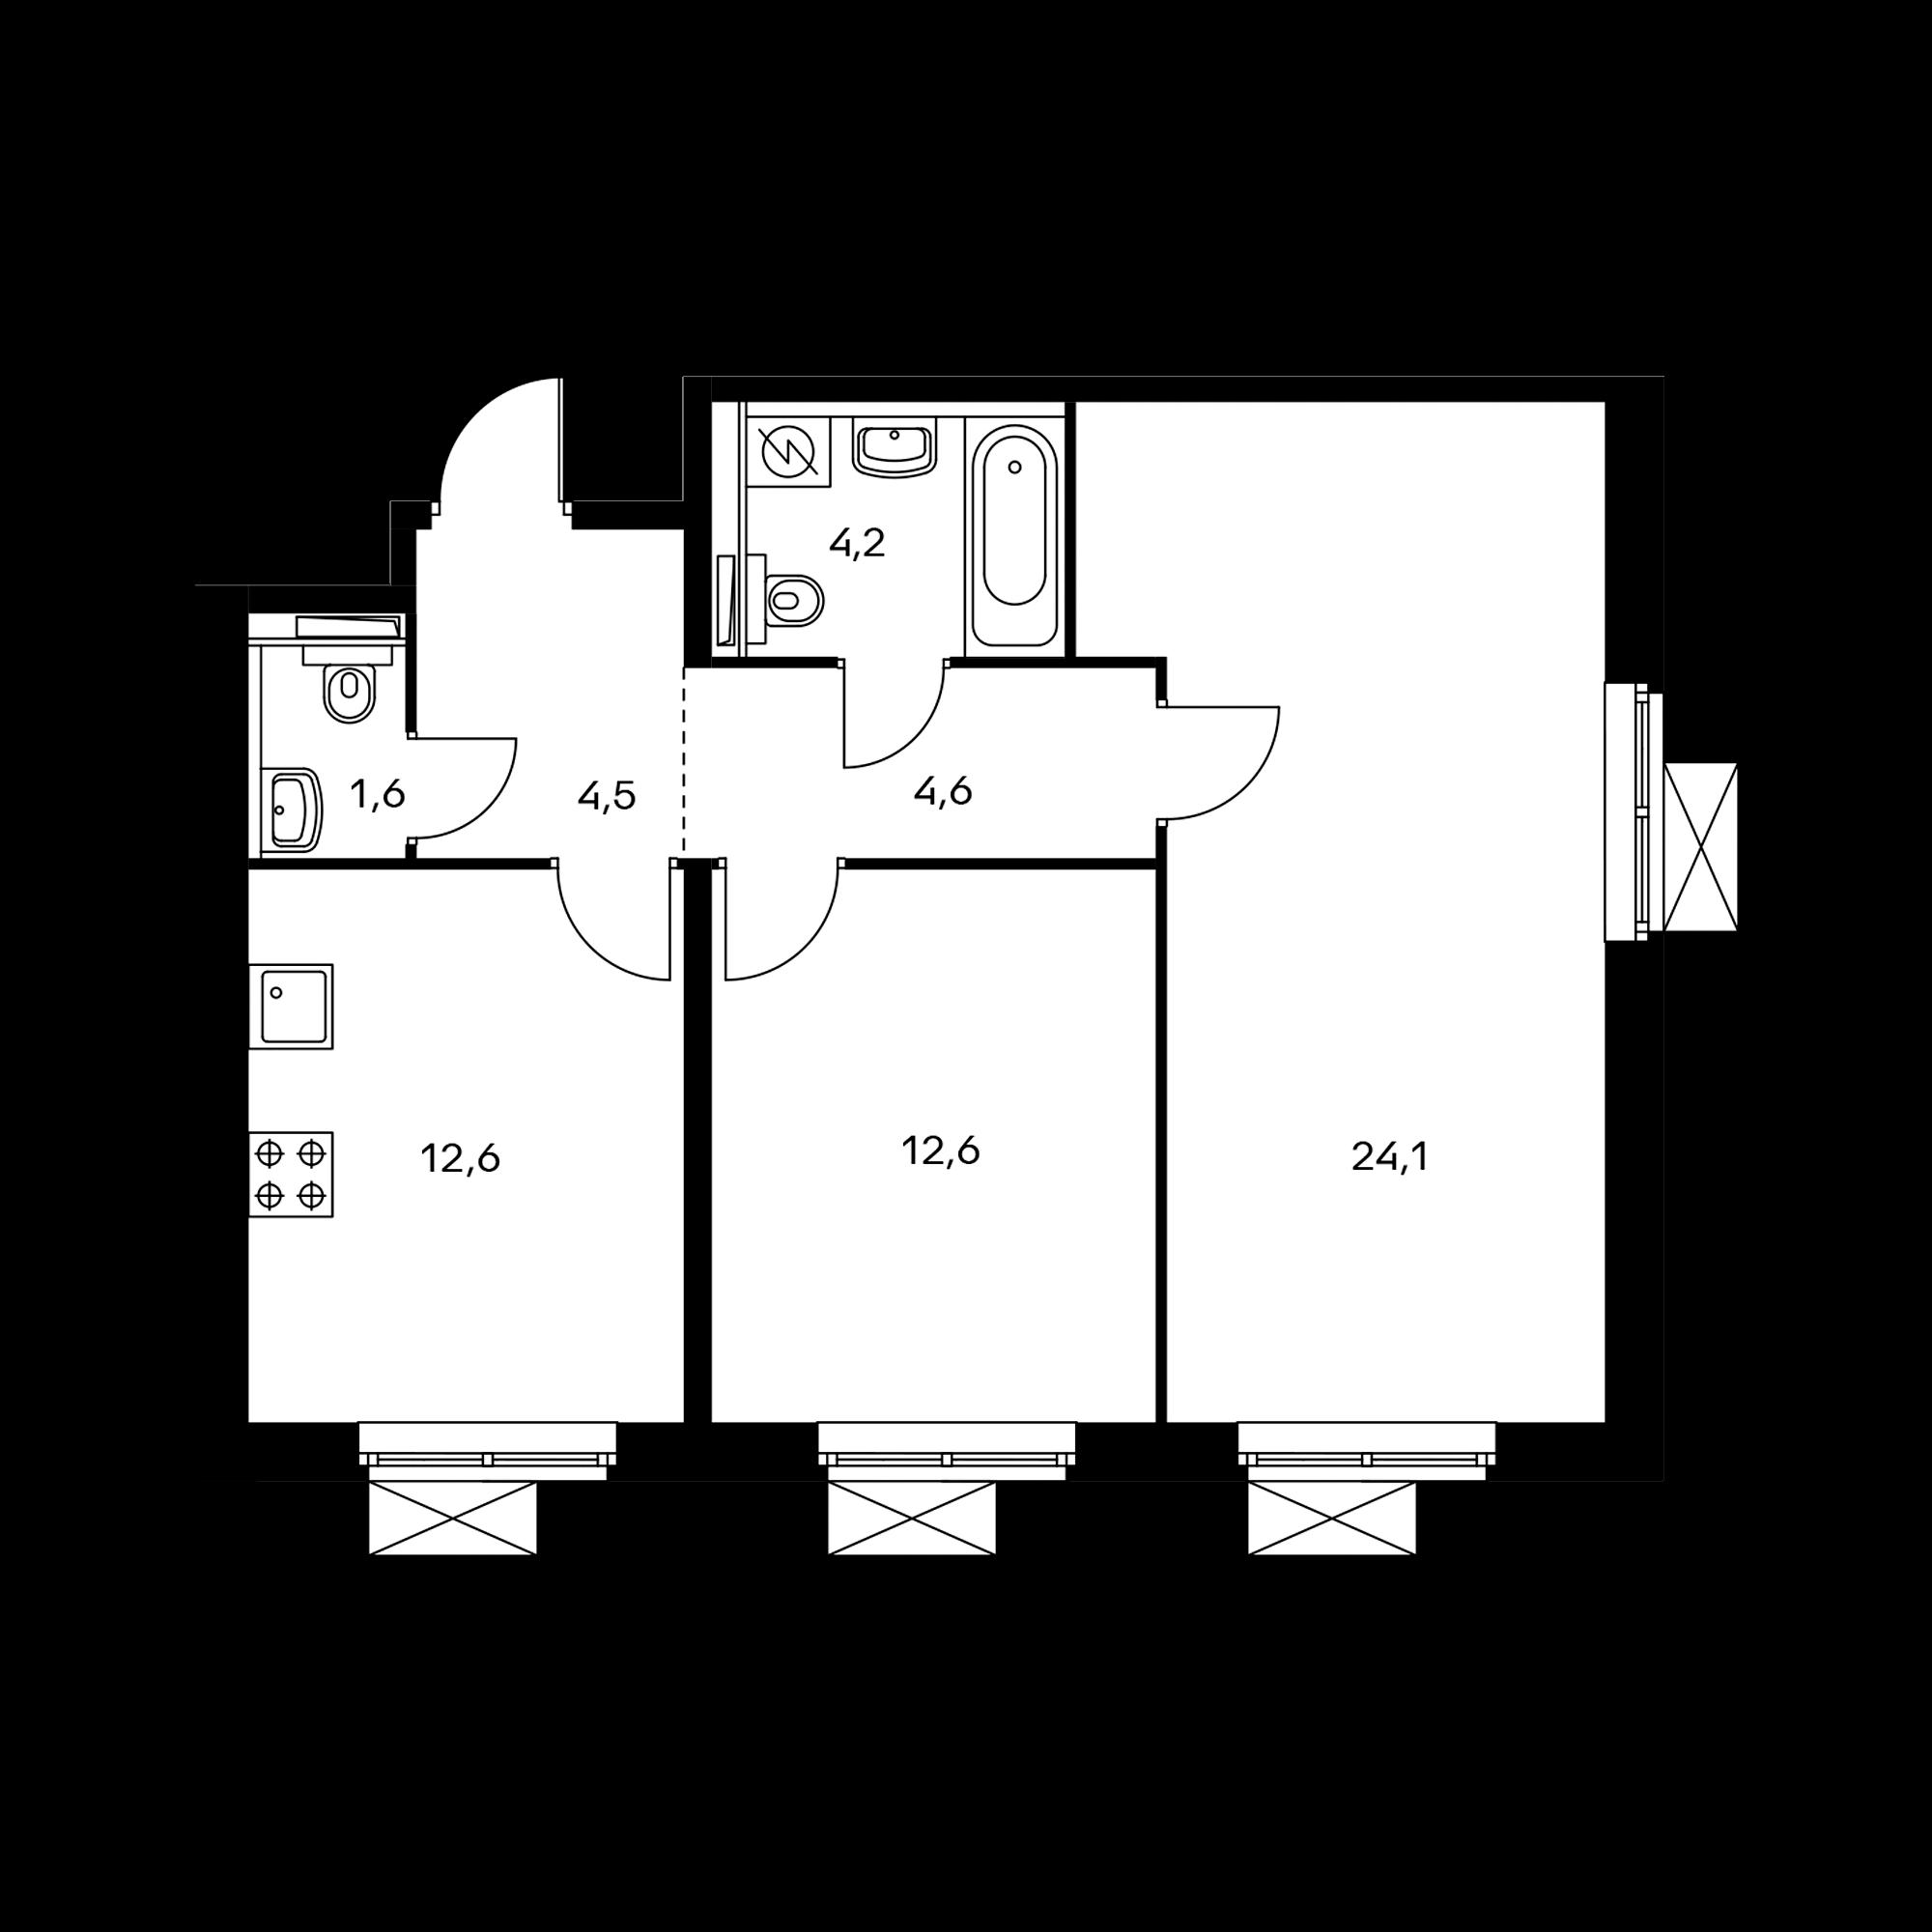 2KL4_9.9-1sz